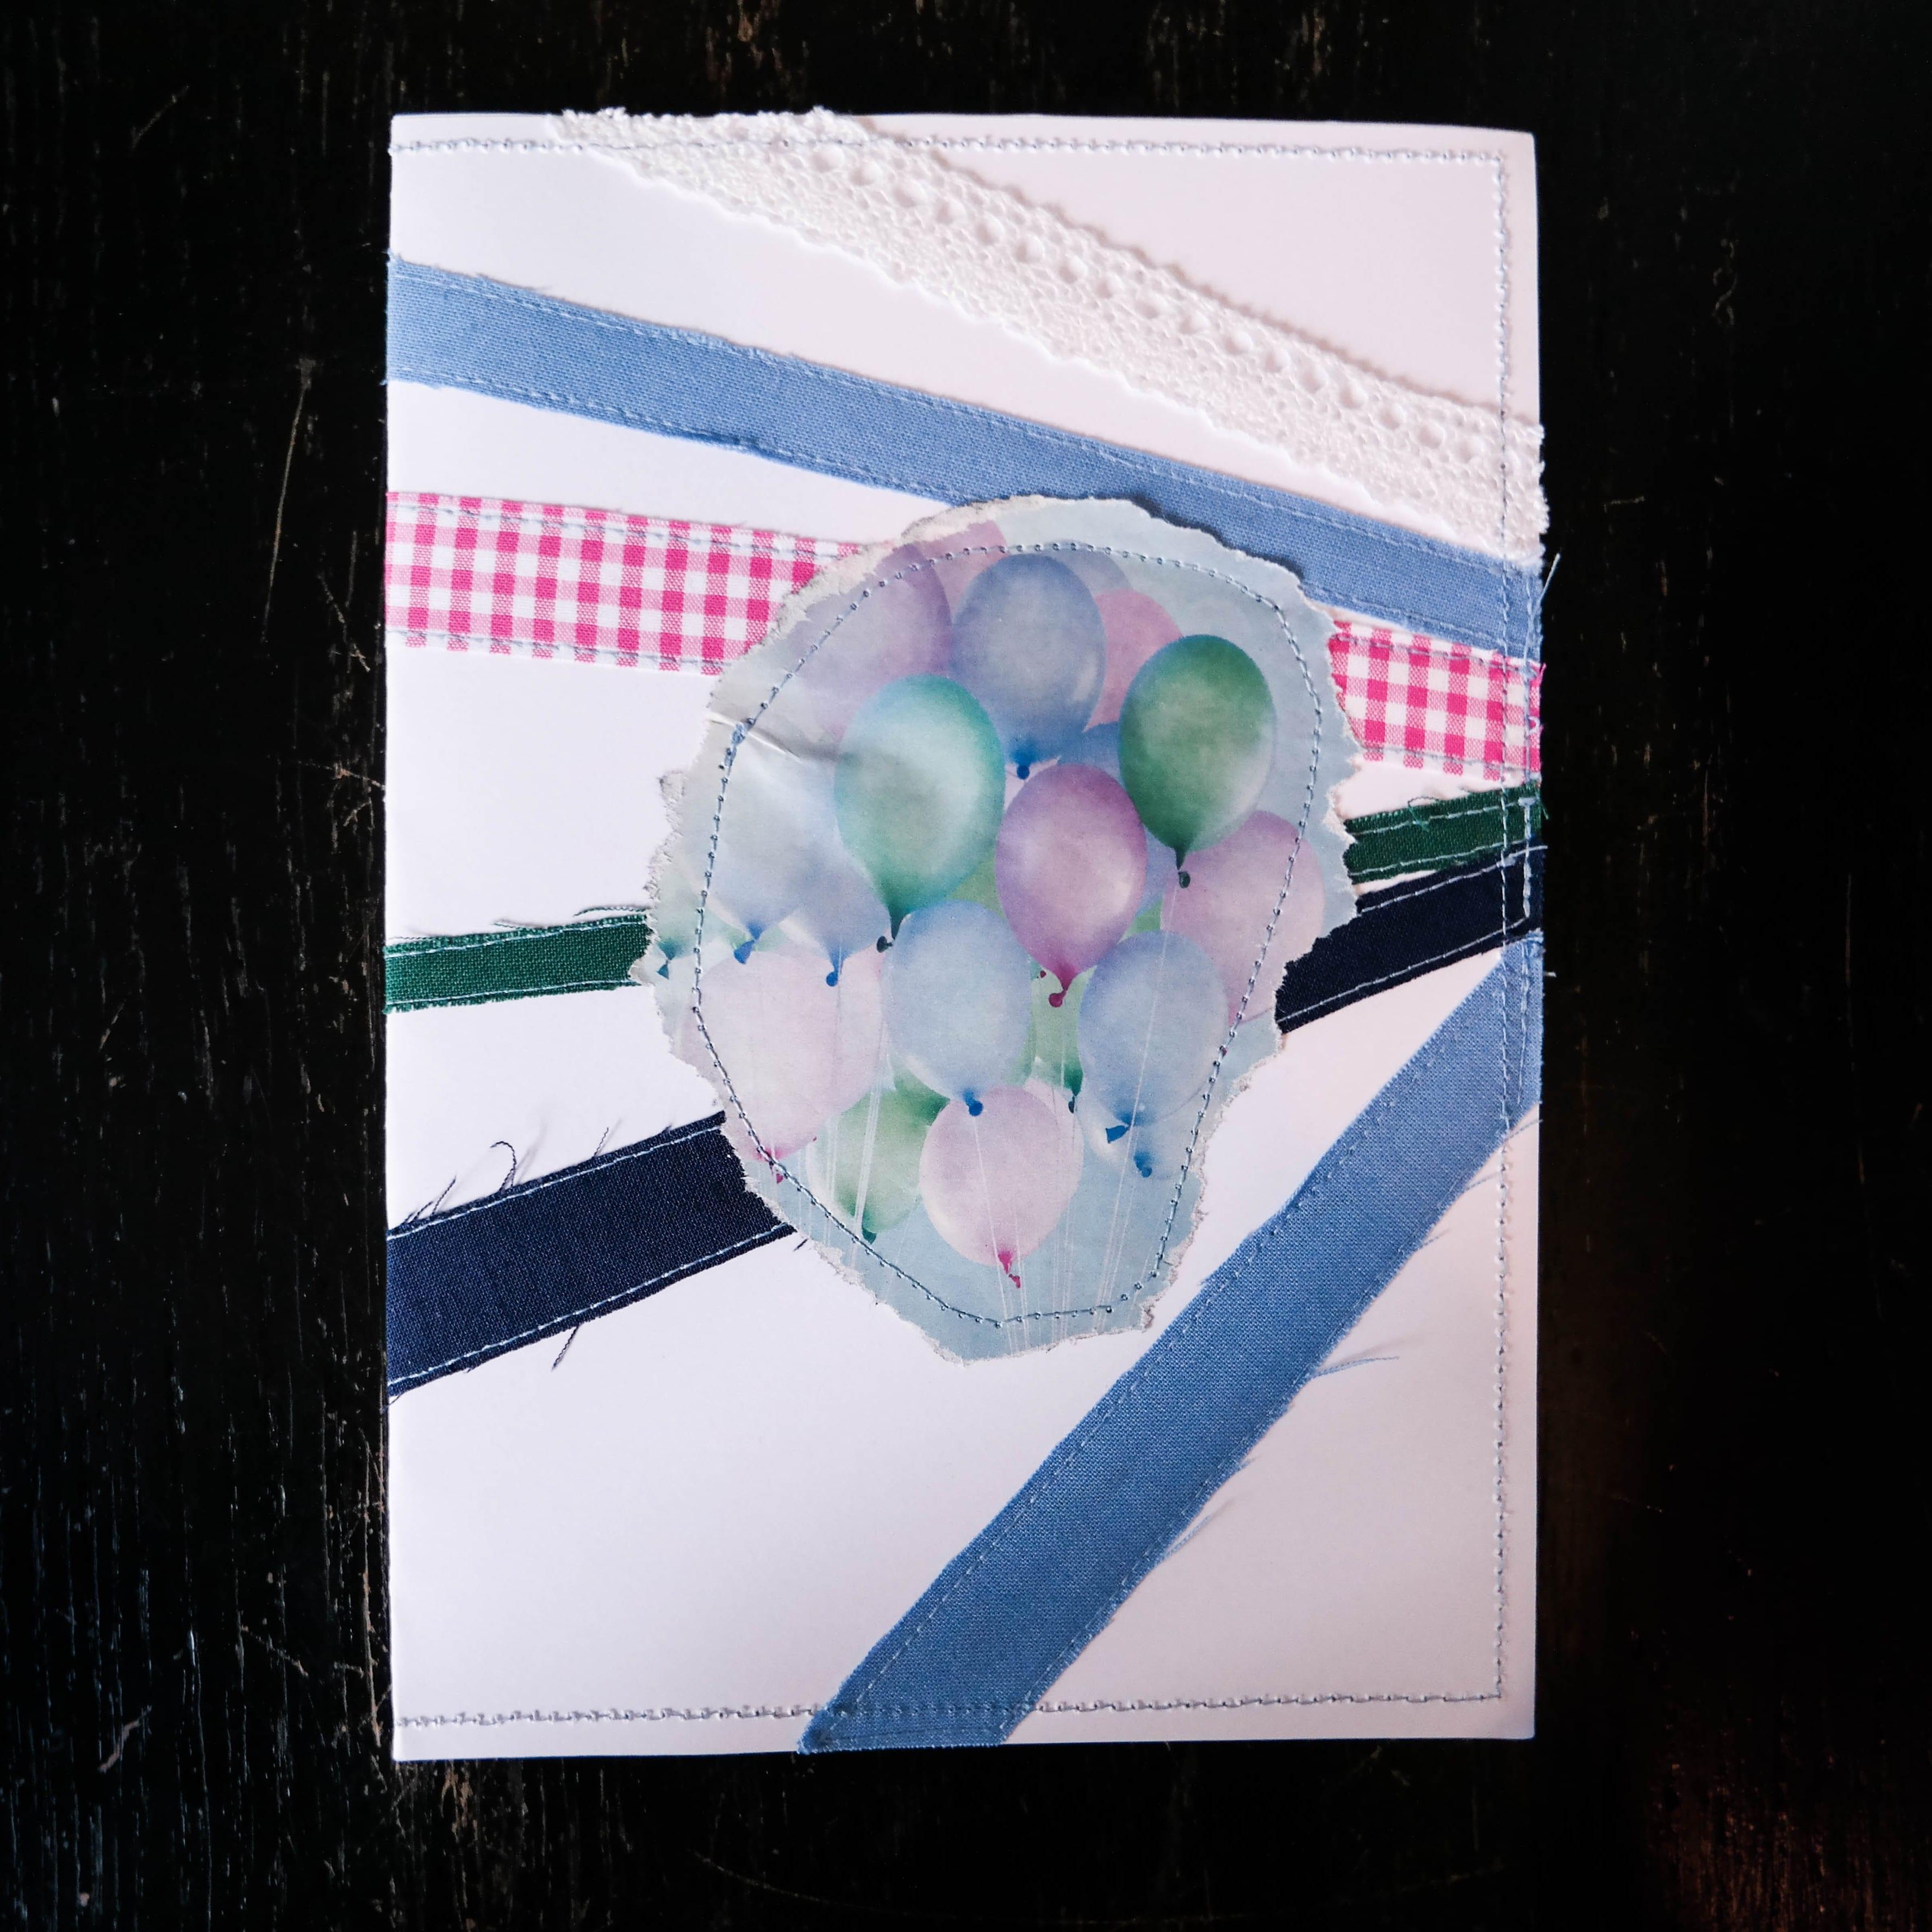 DIY Geburtstagskarte, DIY Geschenke, DIY Karte, DIY nähen. Vara-Kreativa